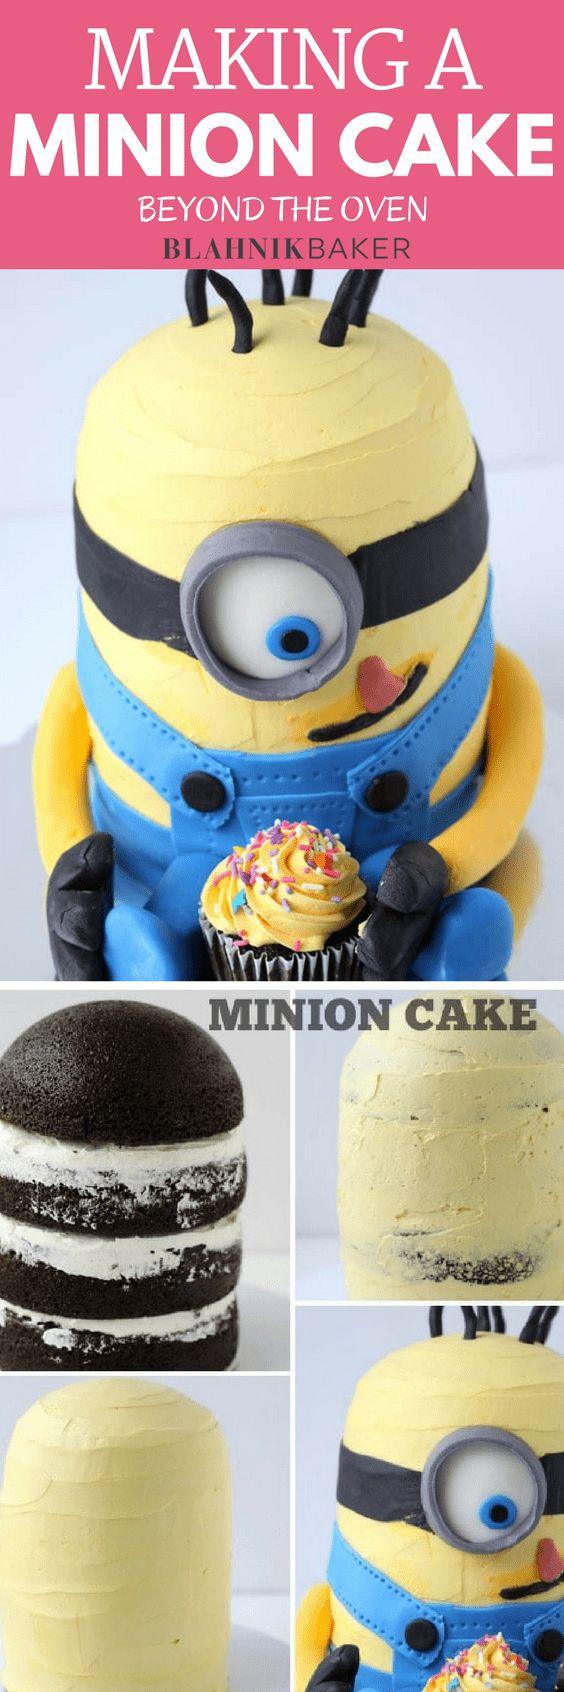 Stepbystep tutorial on making a minion cake Uses chocolate cake